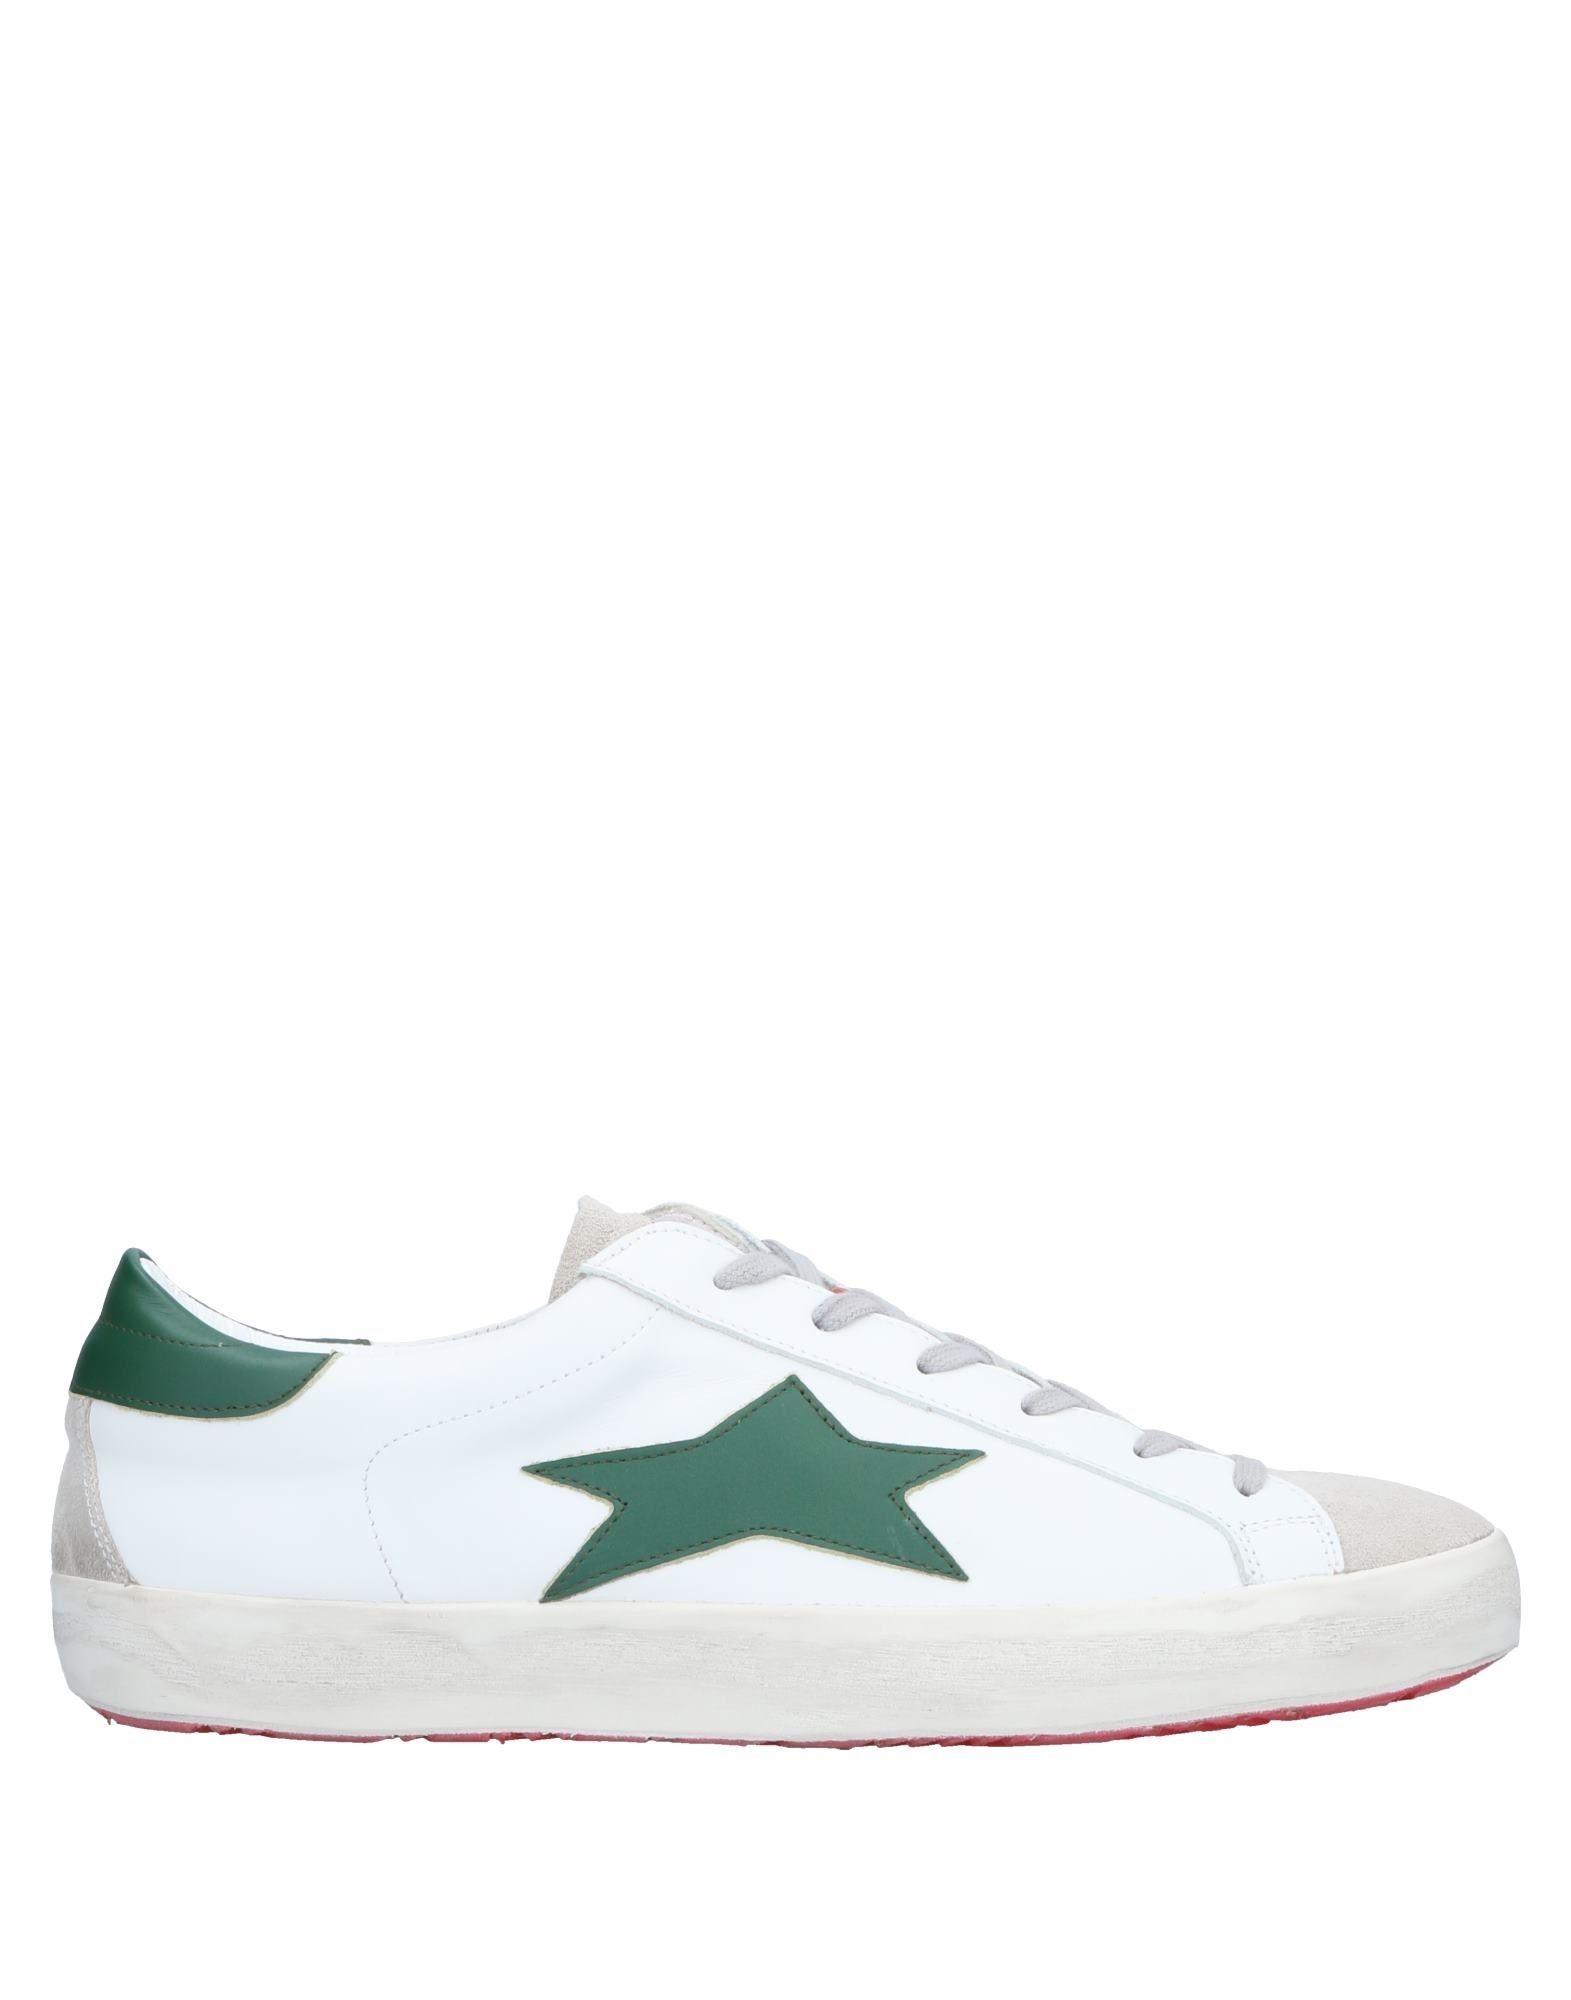 Ishikawa Sneakers Herren  11543961DH Gute Qualität beliebte Schuhe